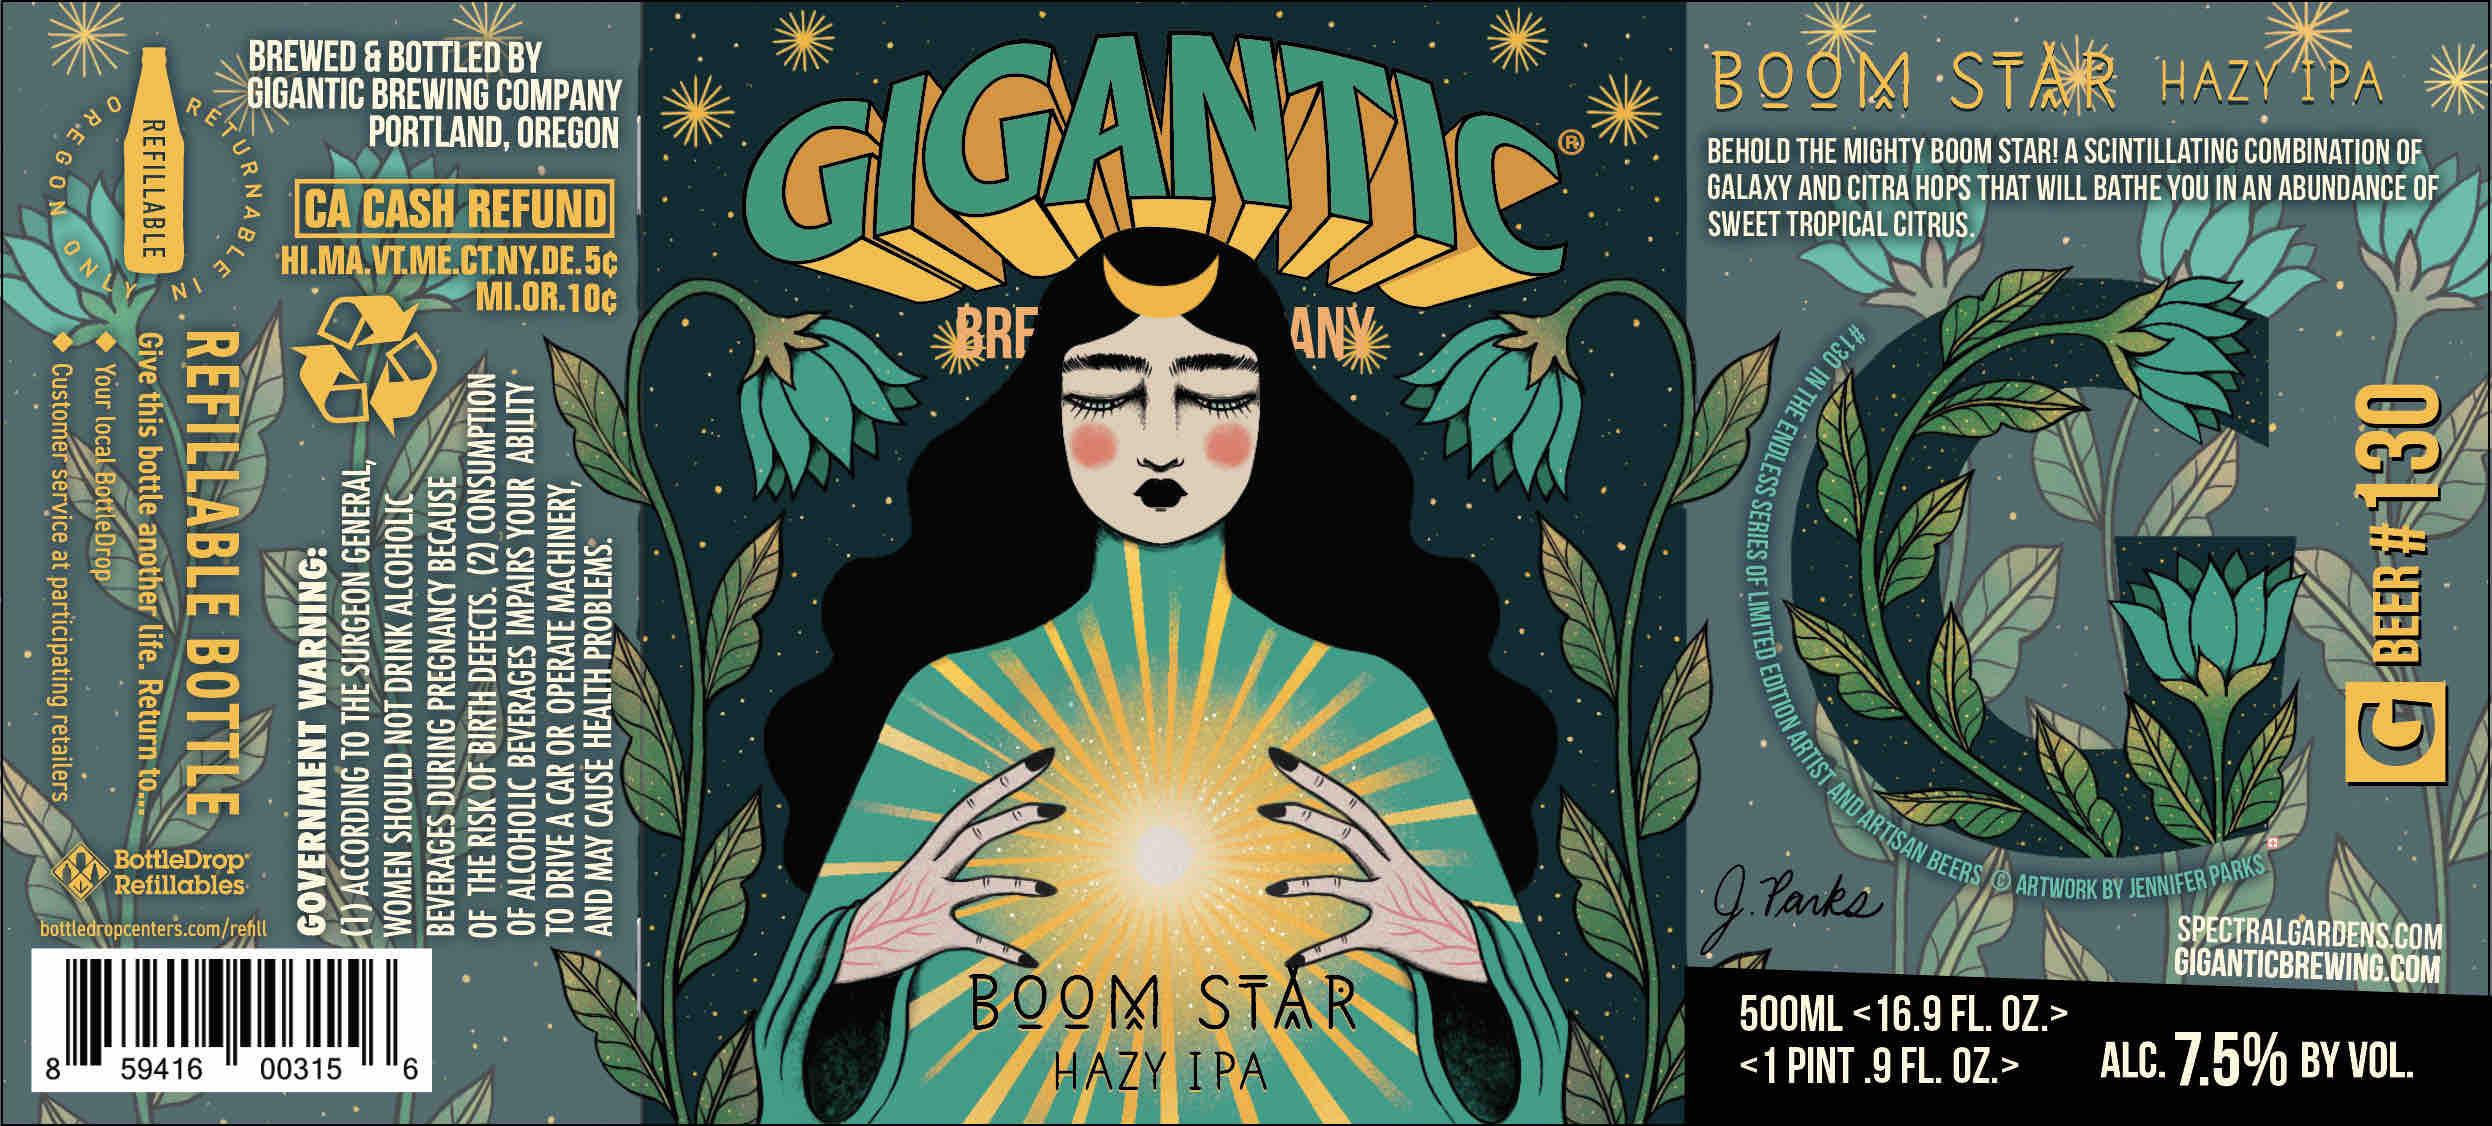 Gigantic Brewing Boom Star Hazy IPA